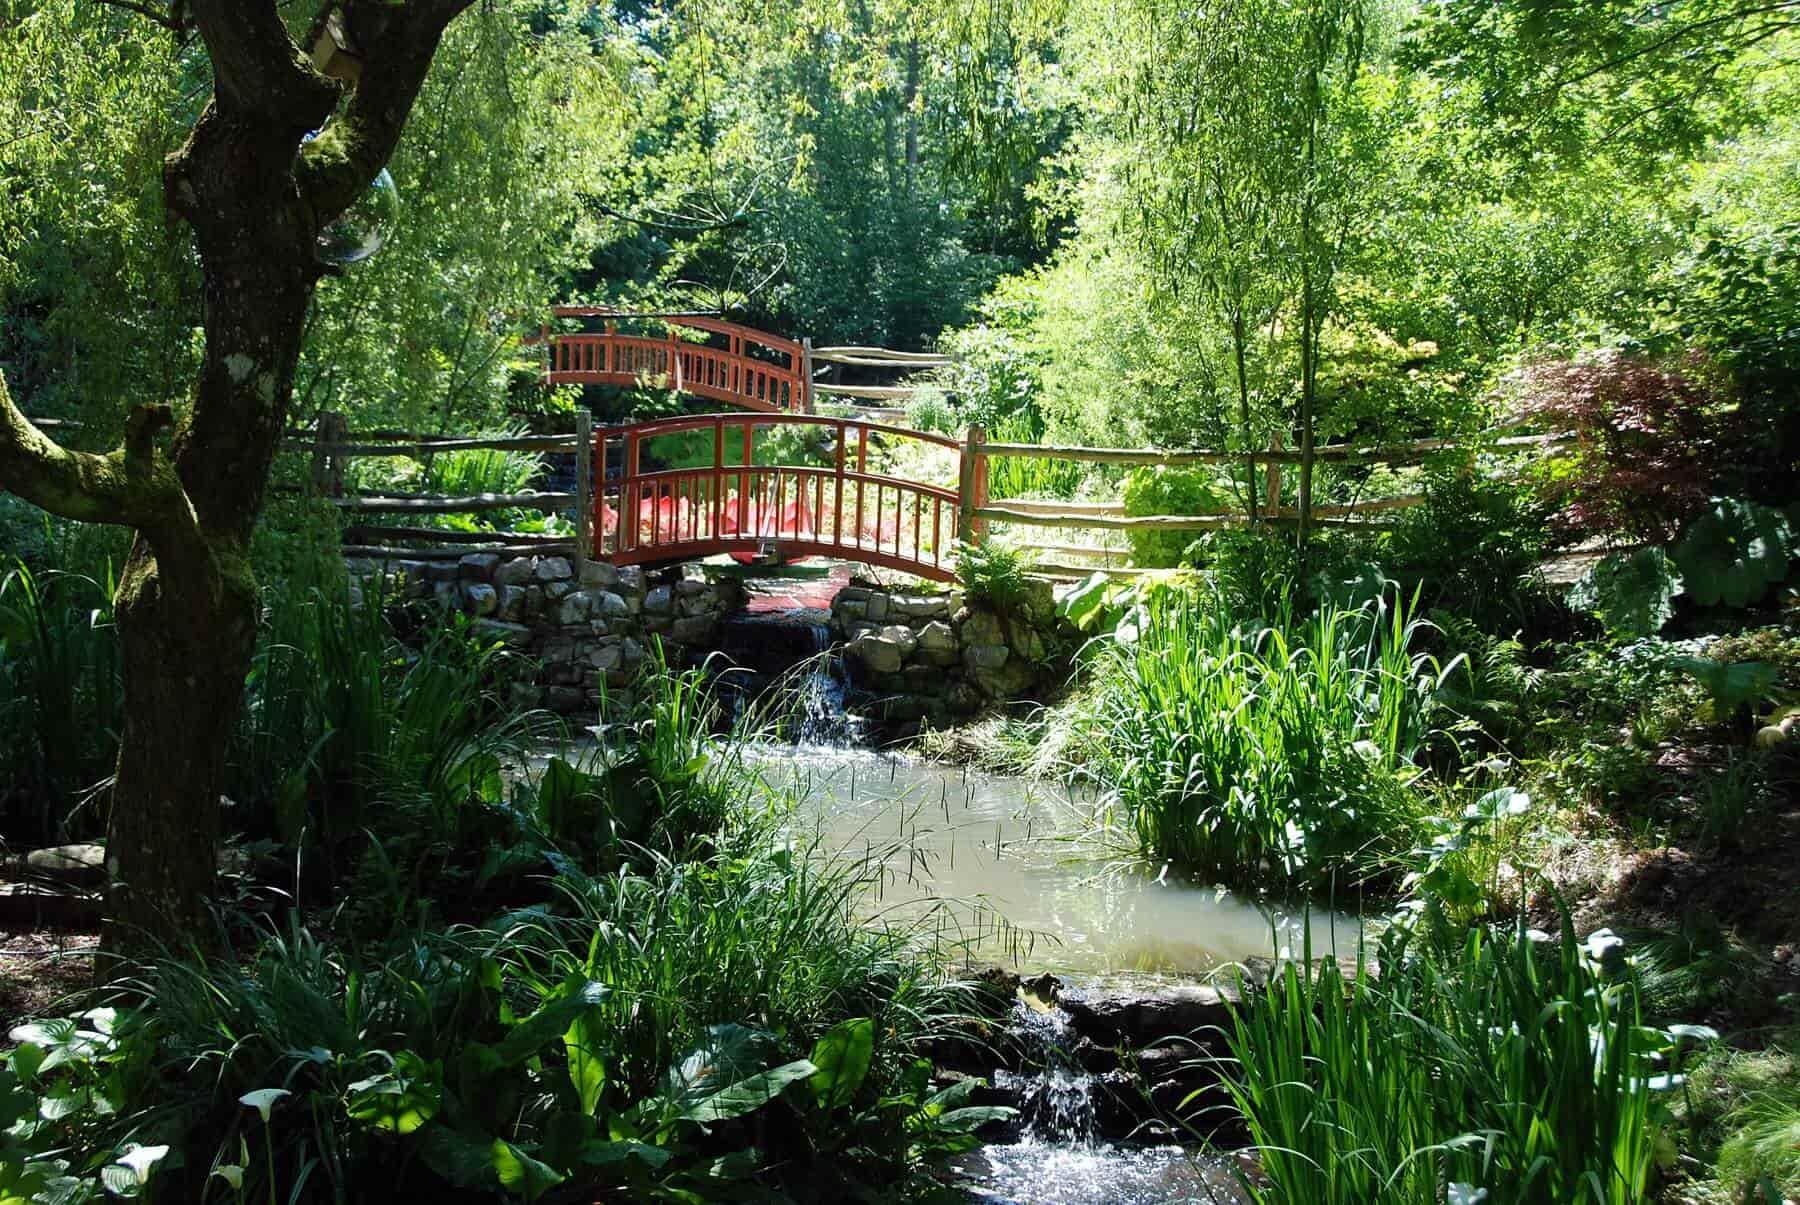 Red bridges criss cross in the historic gardens.